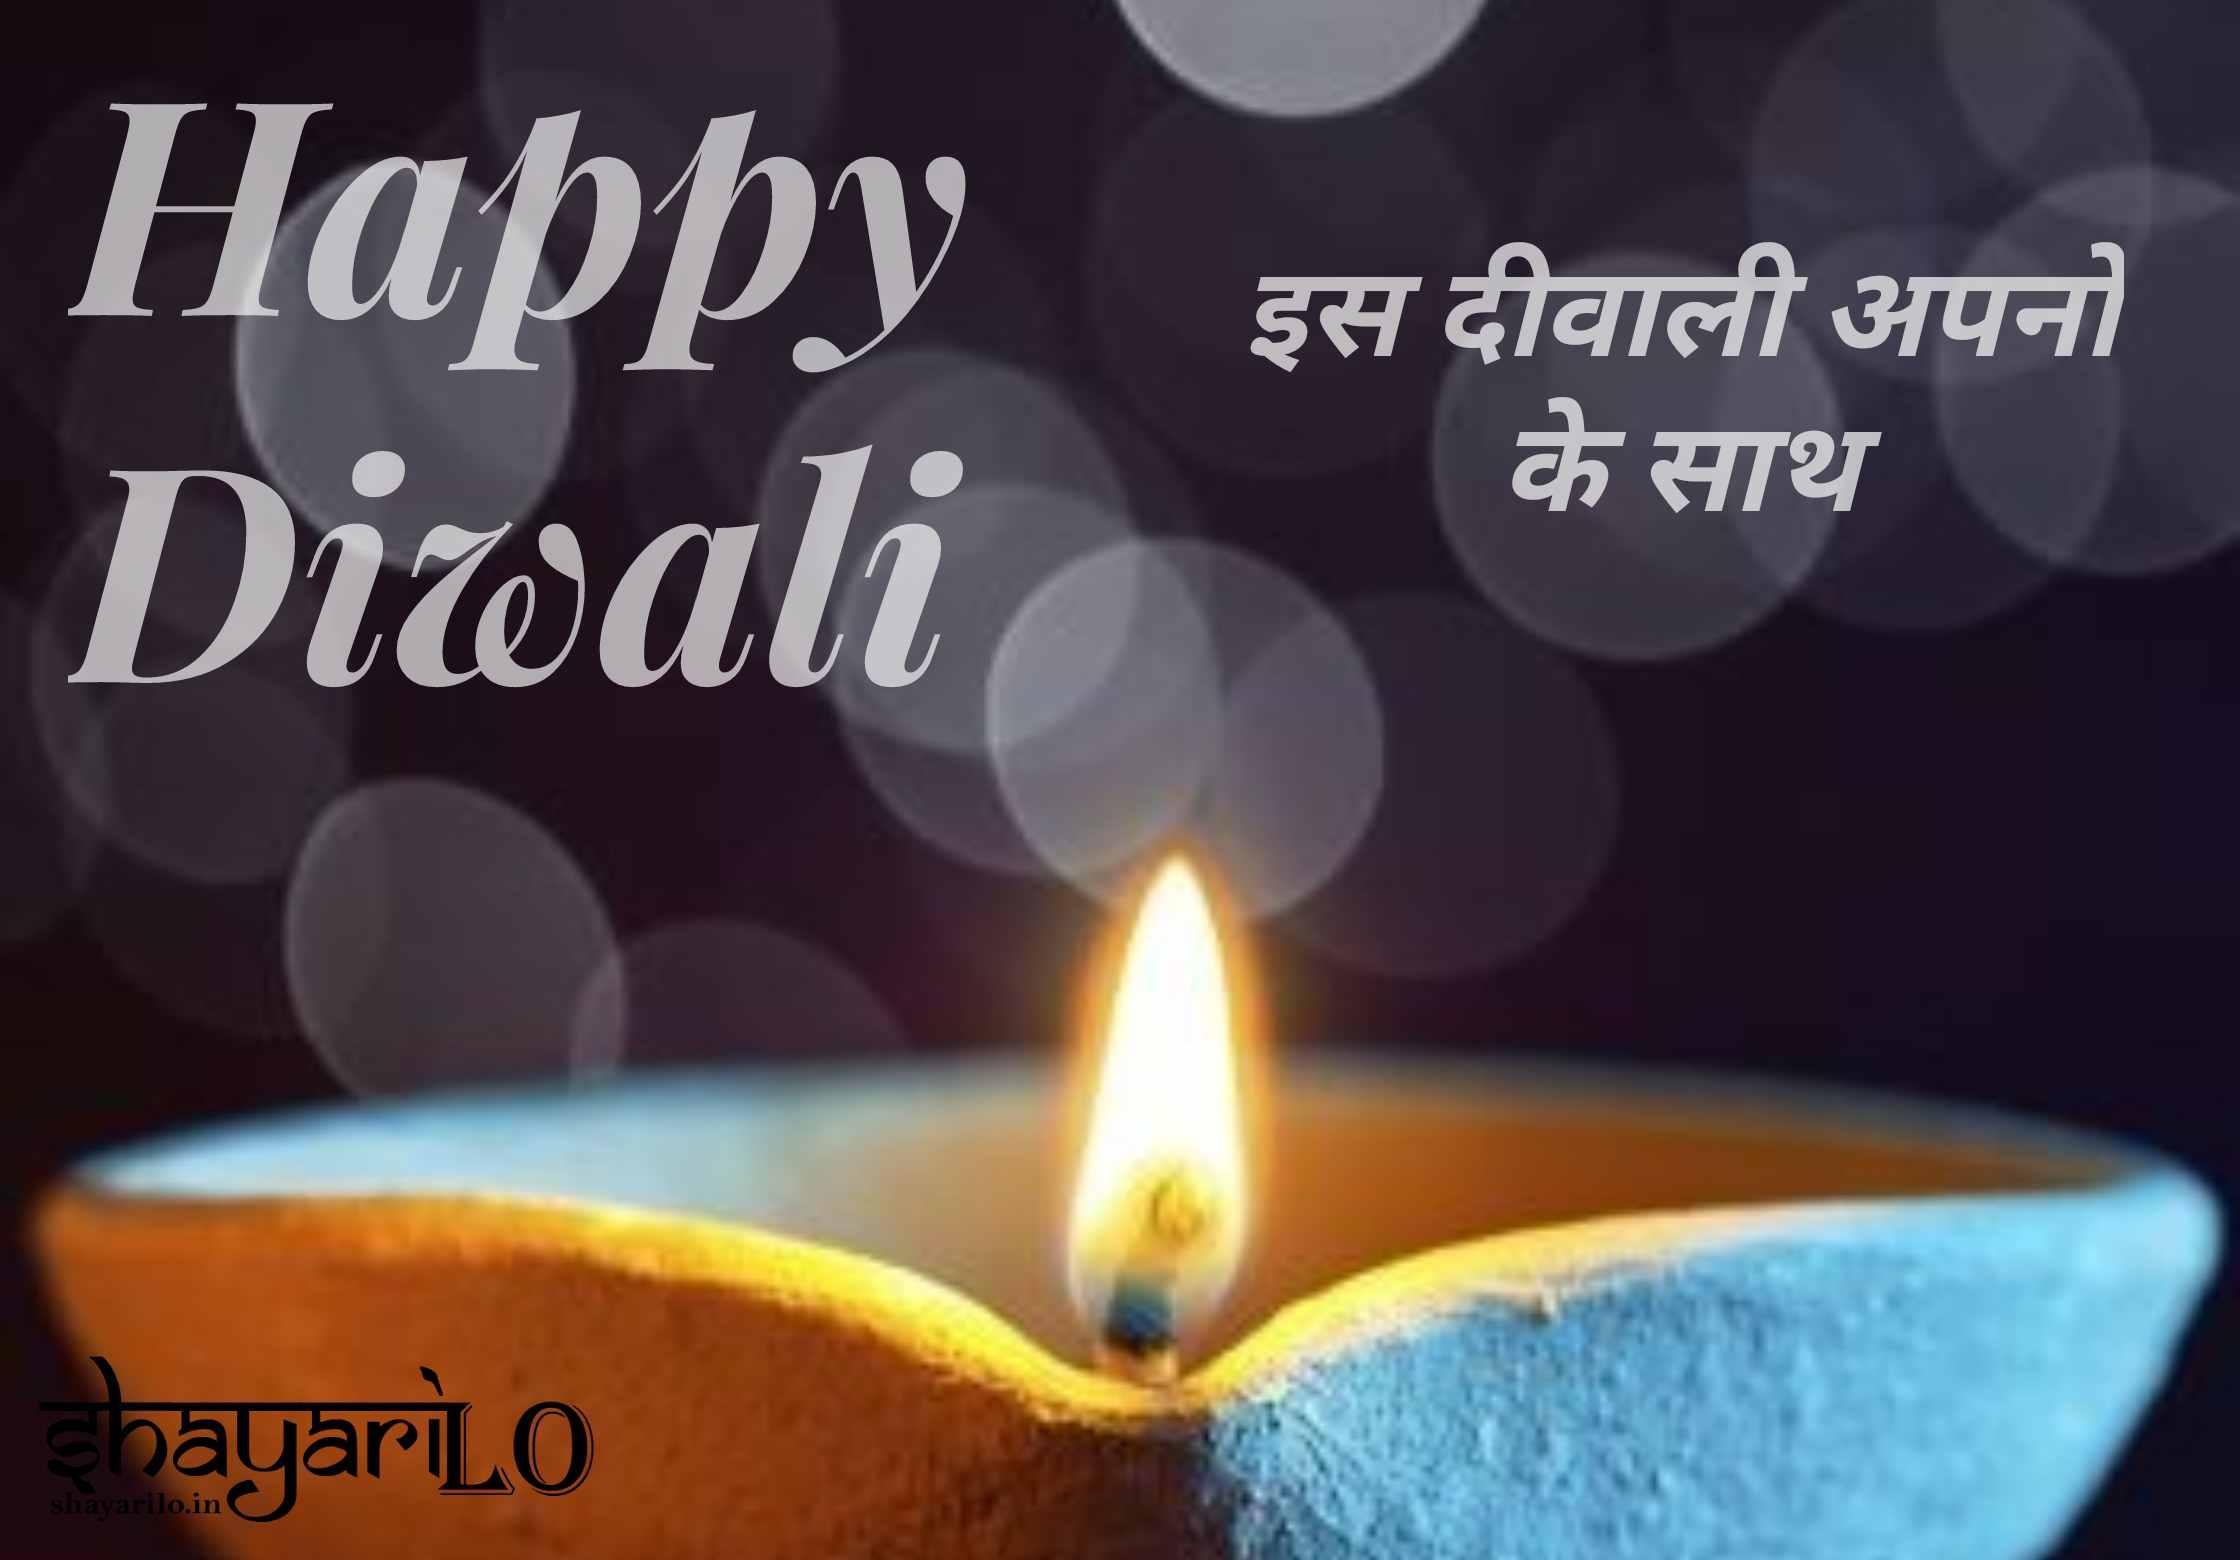 Diwali wishes hindi and english font